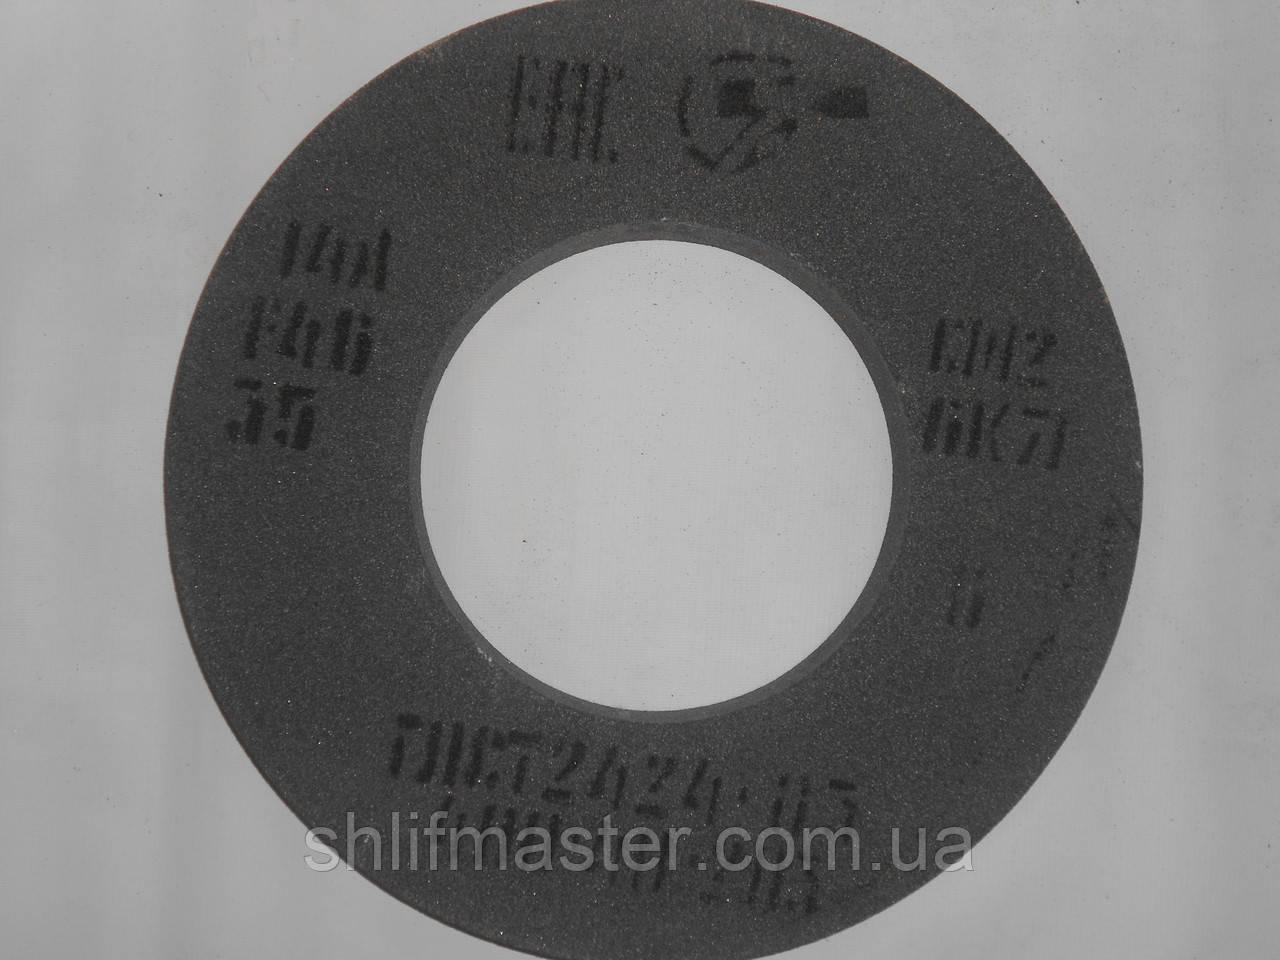 Круг шлифовальный электрокорунд серый керамика 14А ПП 400х20х203 40 СМ/F40 K